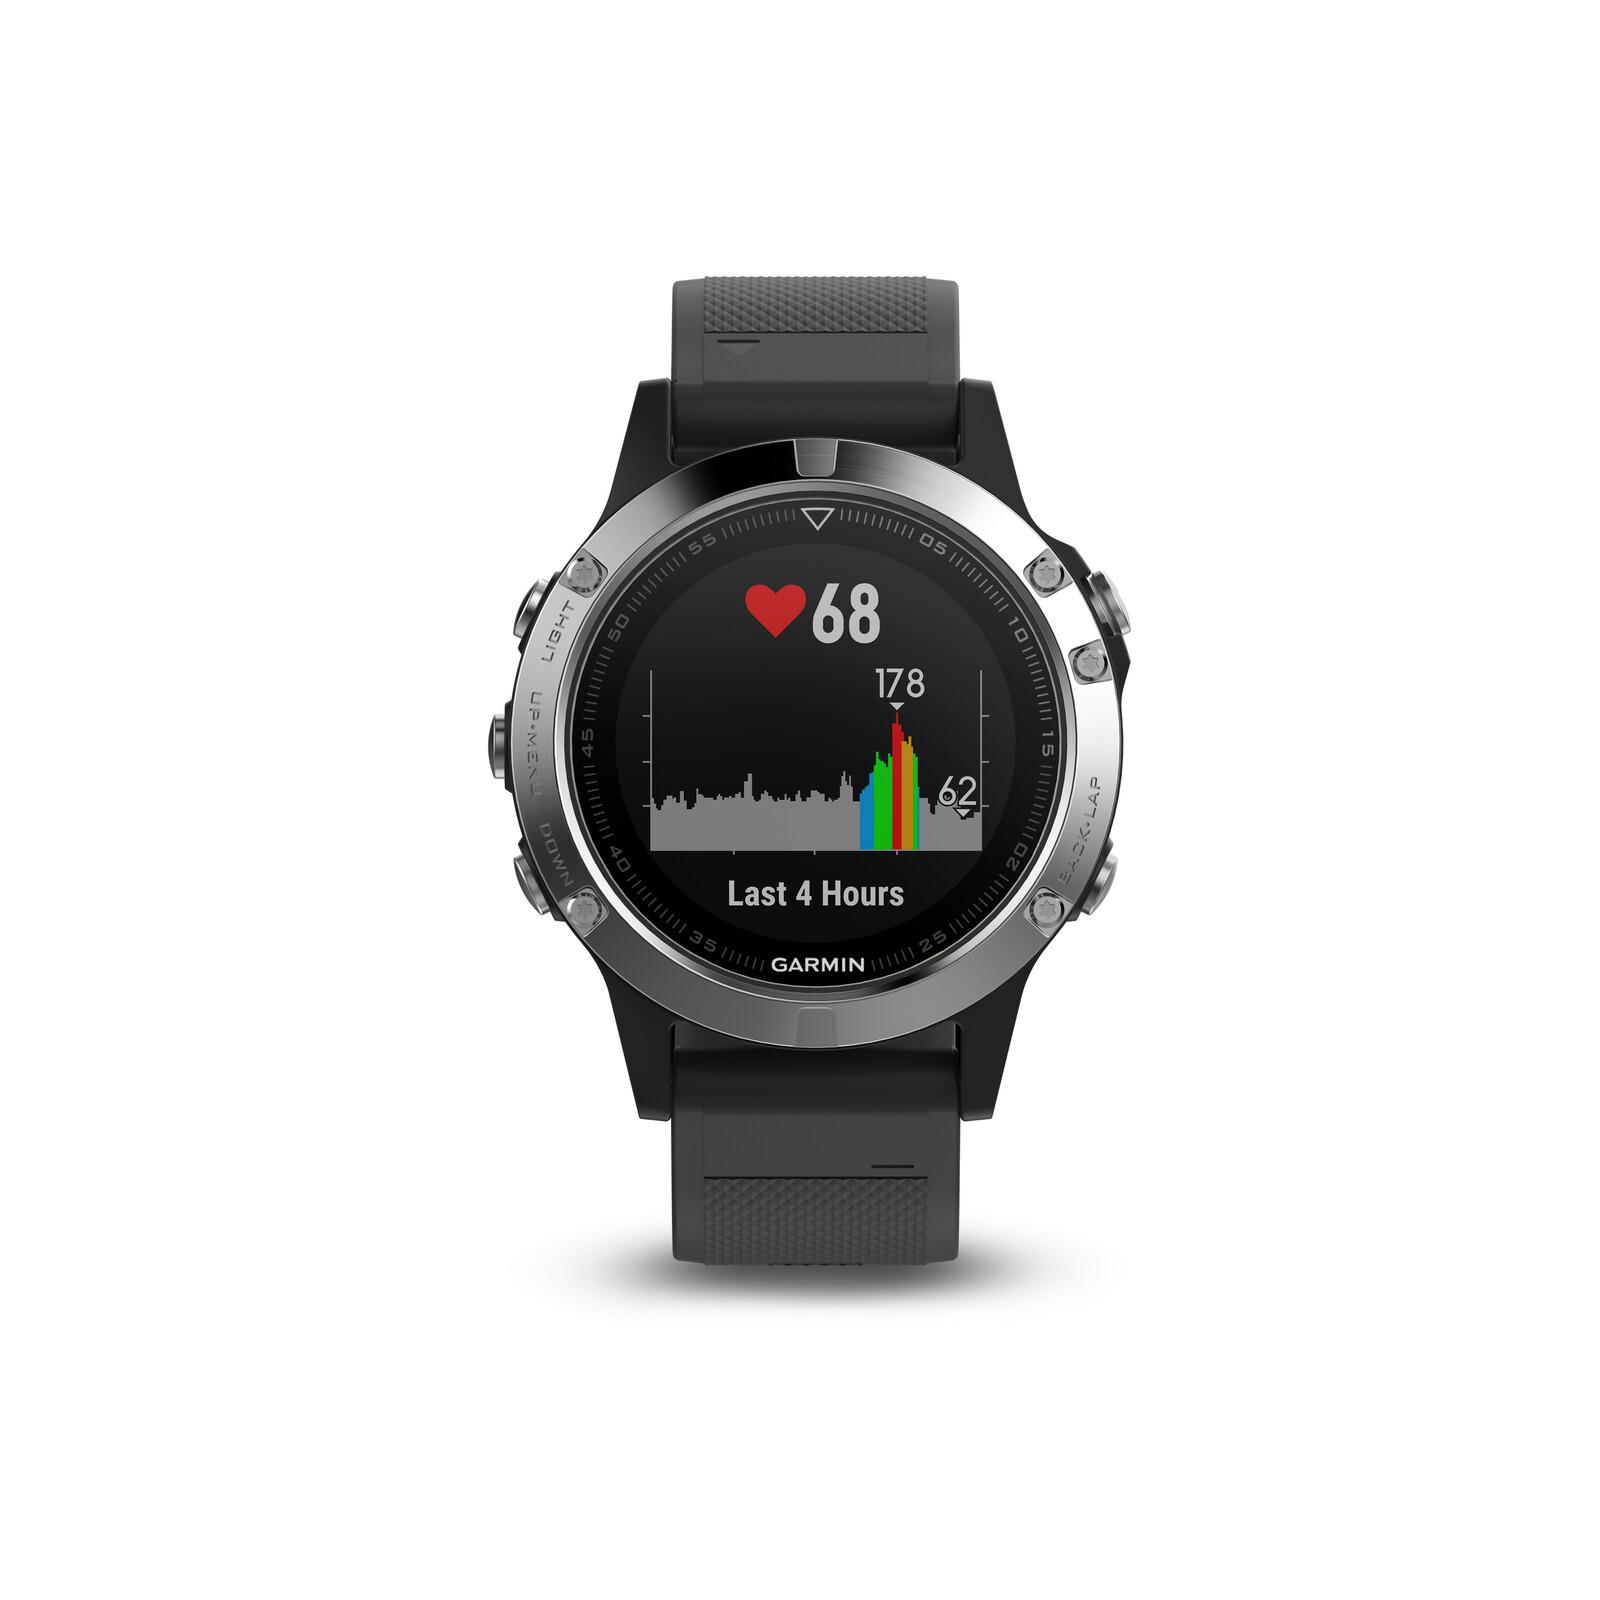 Garmin Fenix 5 Schwarz/Silber Smartwatch